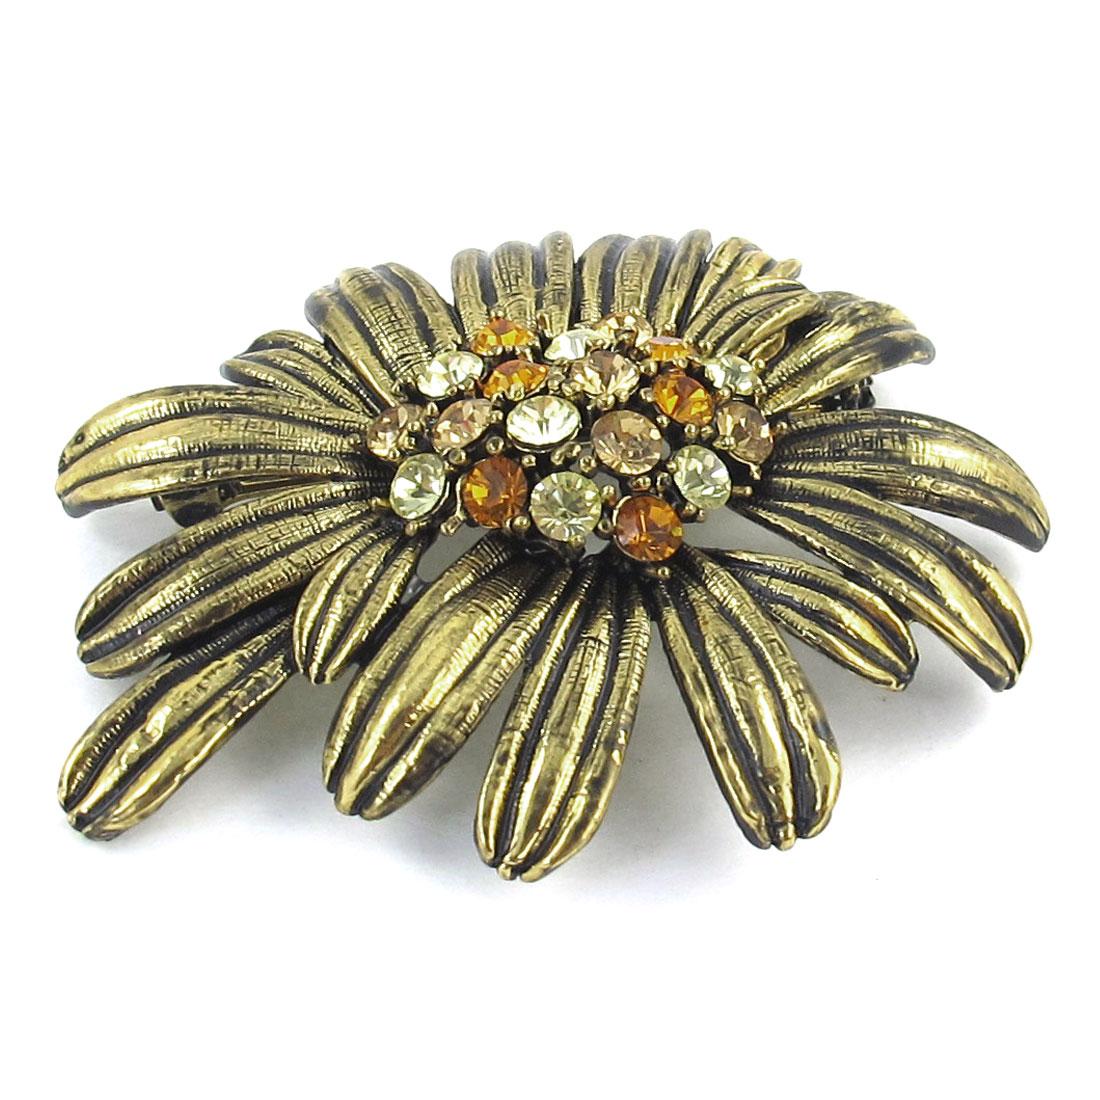 Rhinestone Inlaid Flower Design Metal Safty Pin Brooch Bronze Tone for Ladies